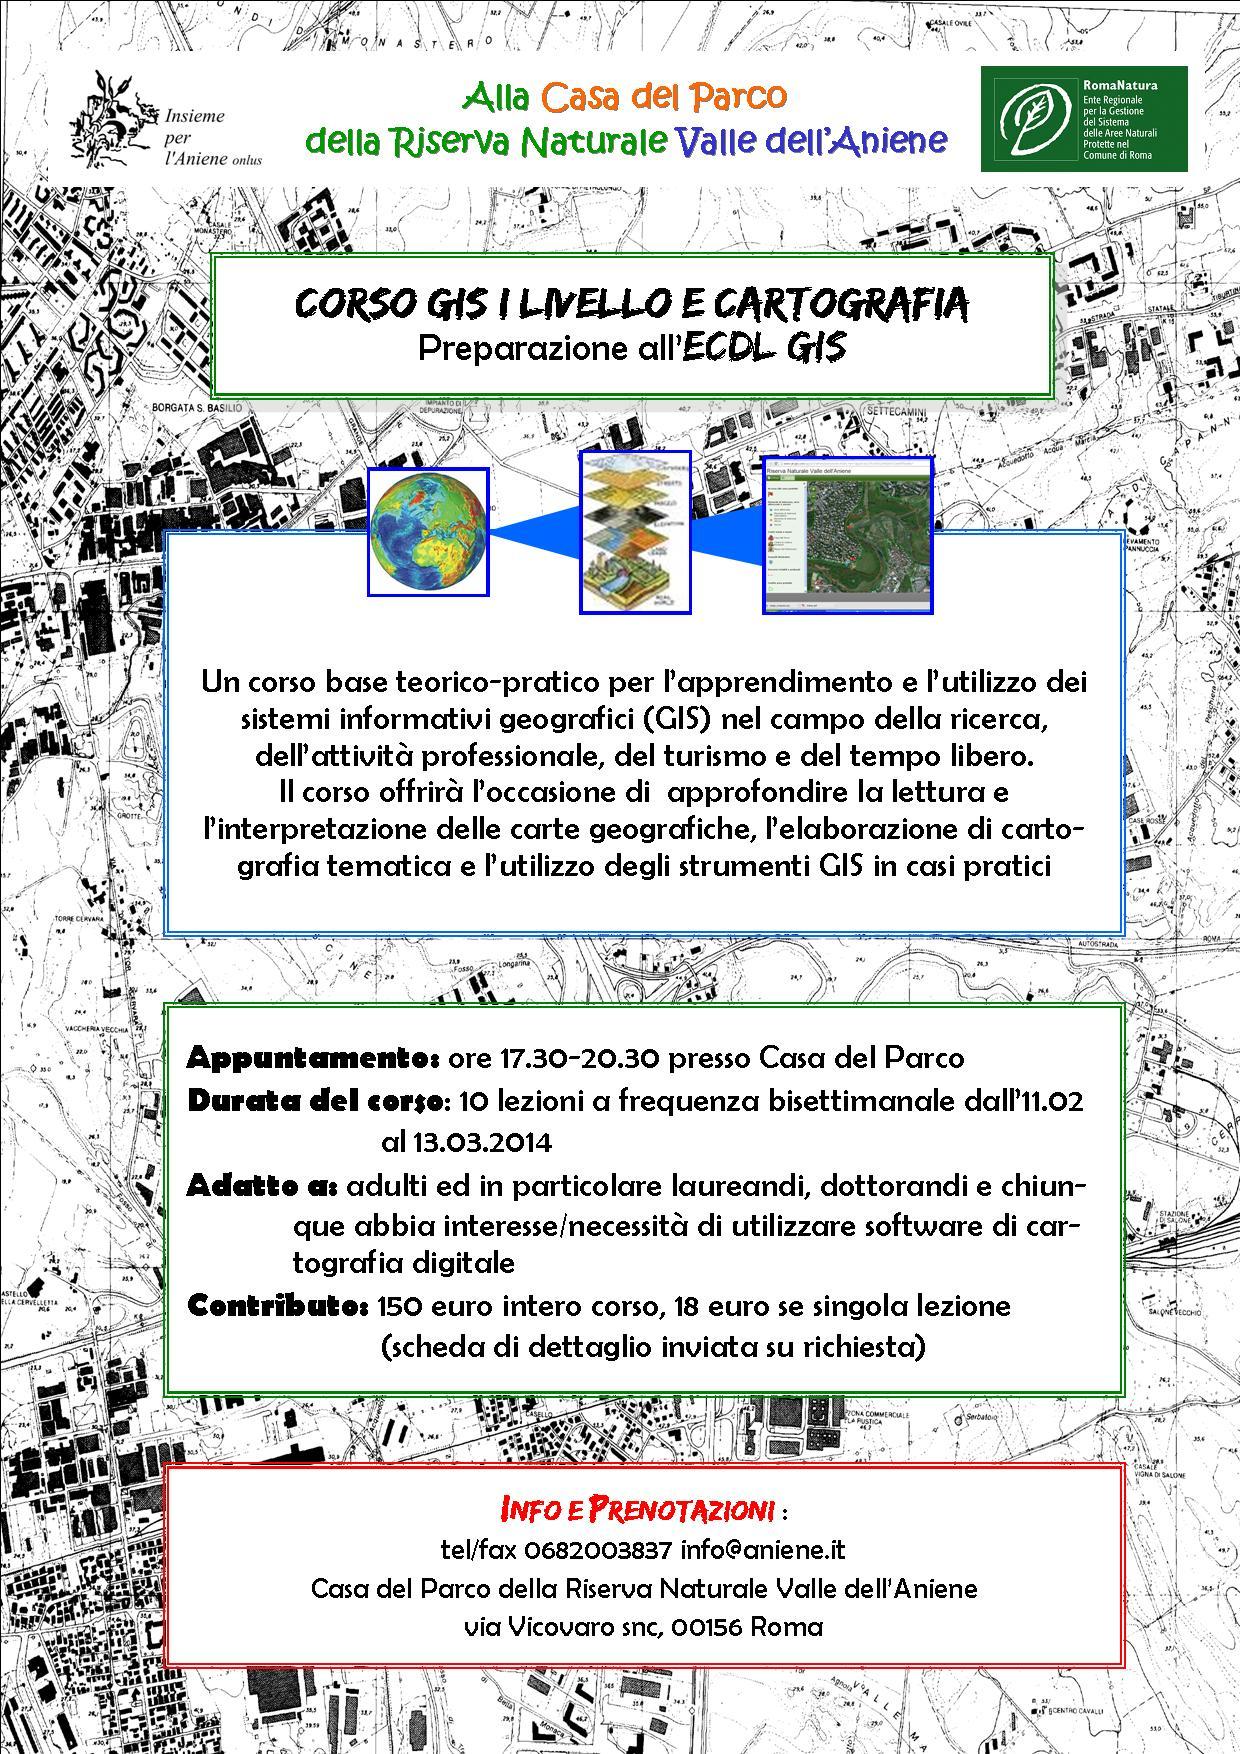 CORSO GIS I LIVELLO E CARTOGRAFIA